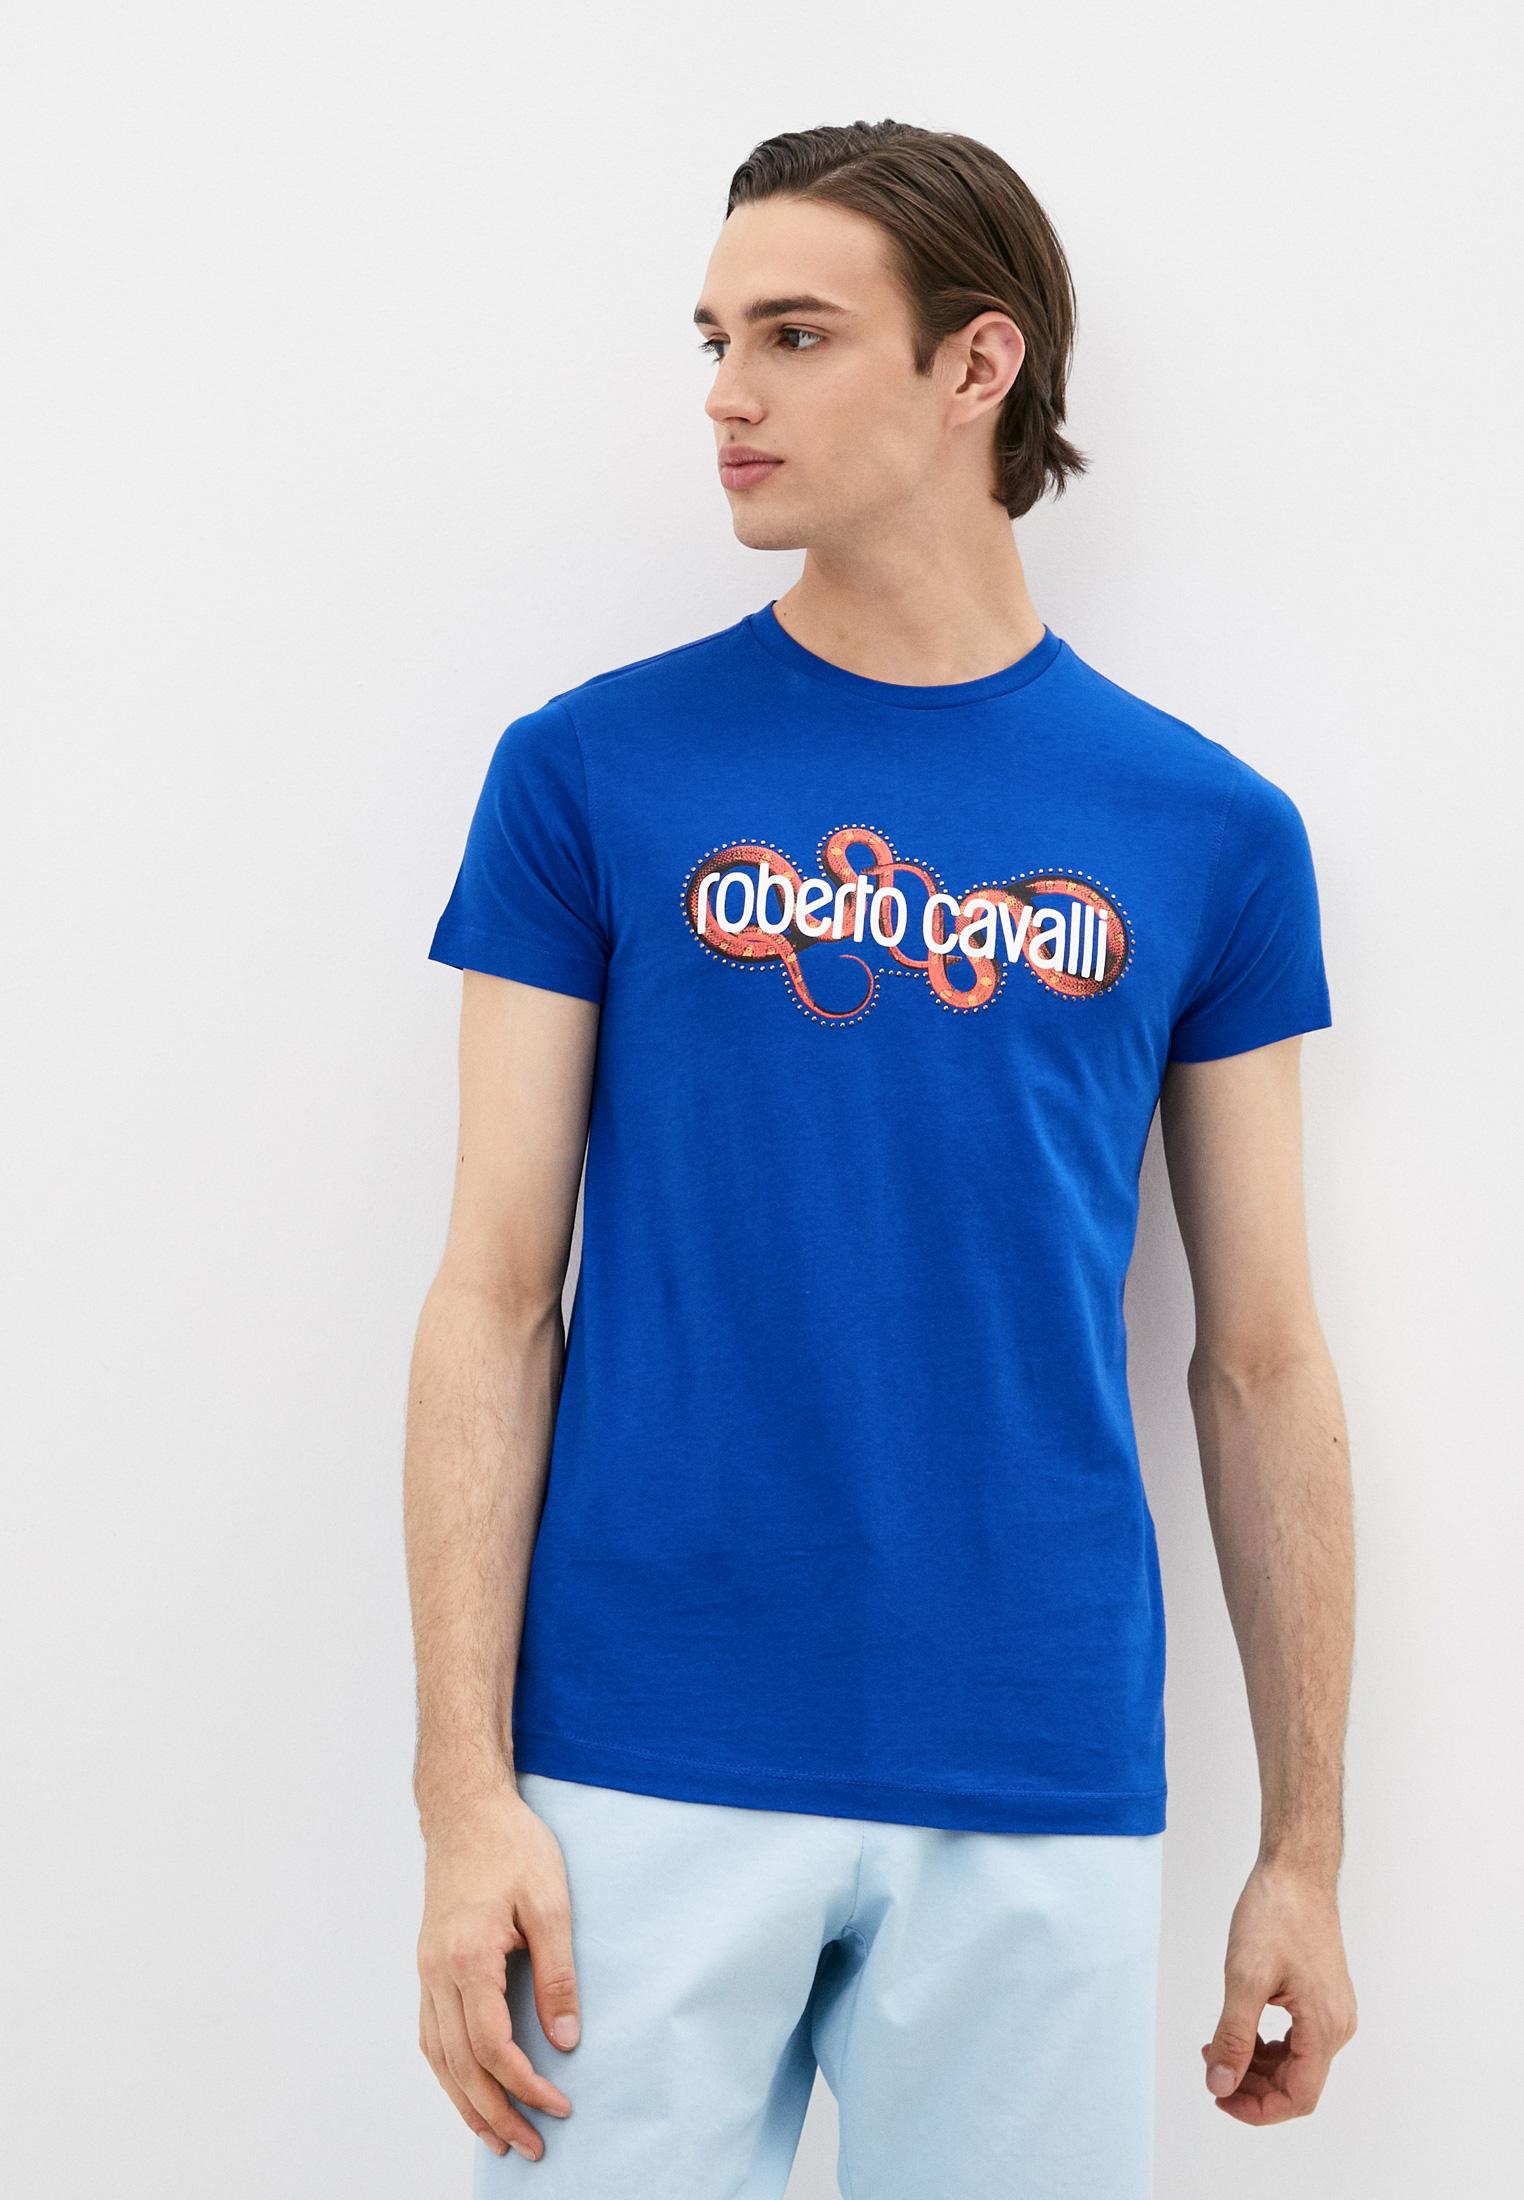 Мужская футболка Roberto Cavalli (Роберто Кавалли) HST62DA270